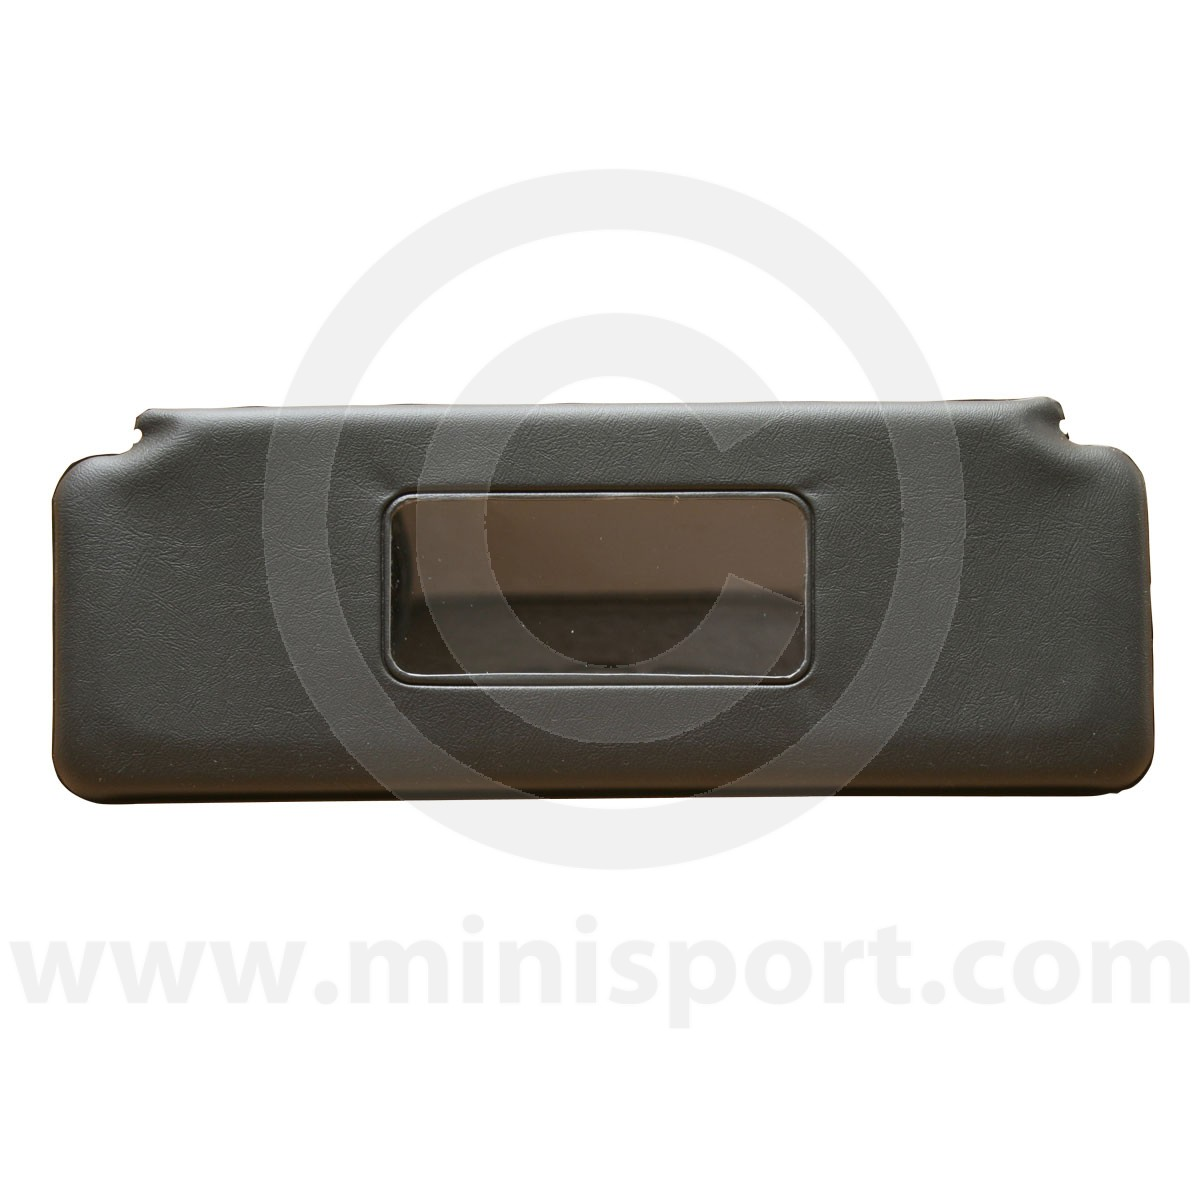 SV2017A Classic Mini sun visor in black with mirror 03db5b5d115